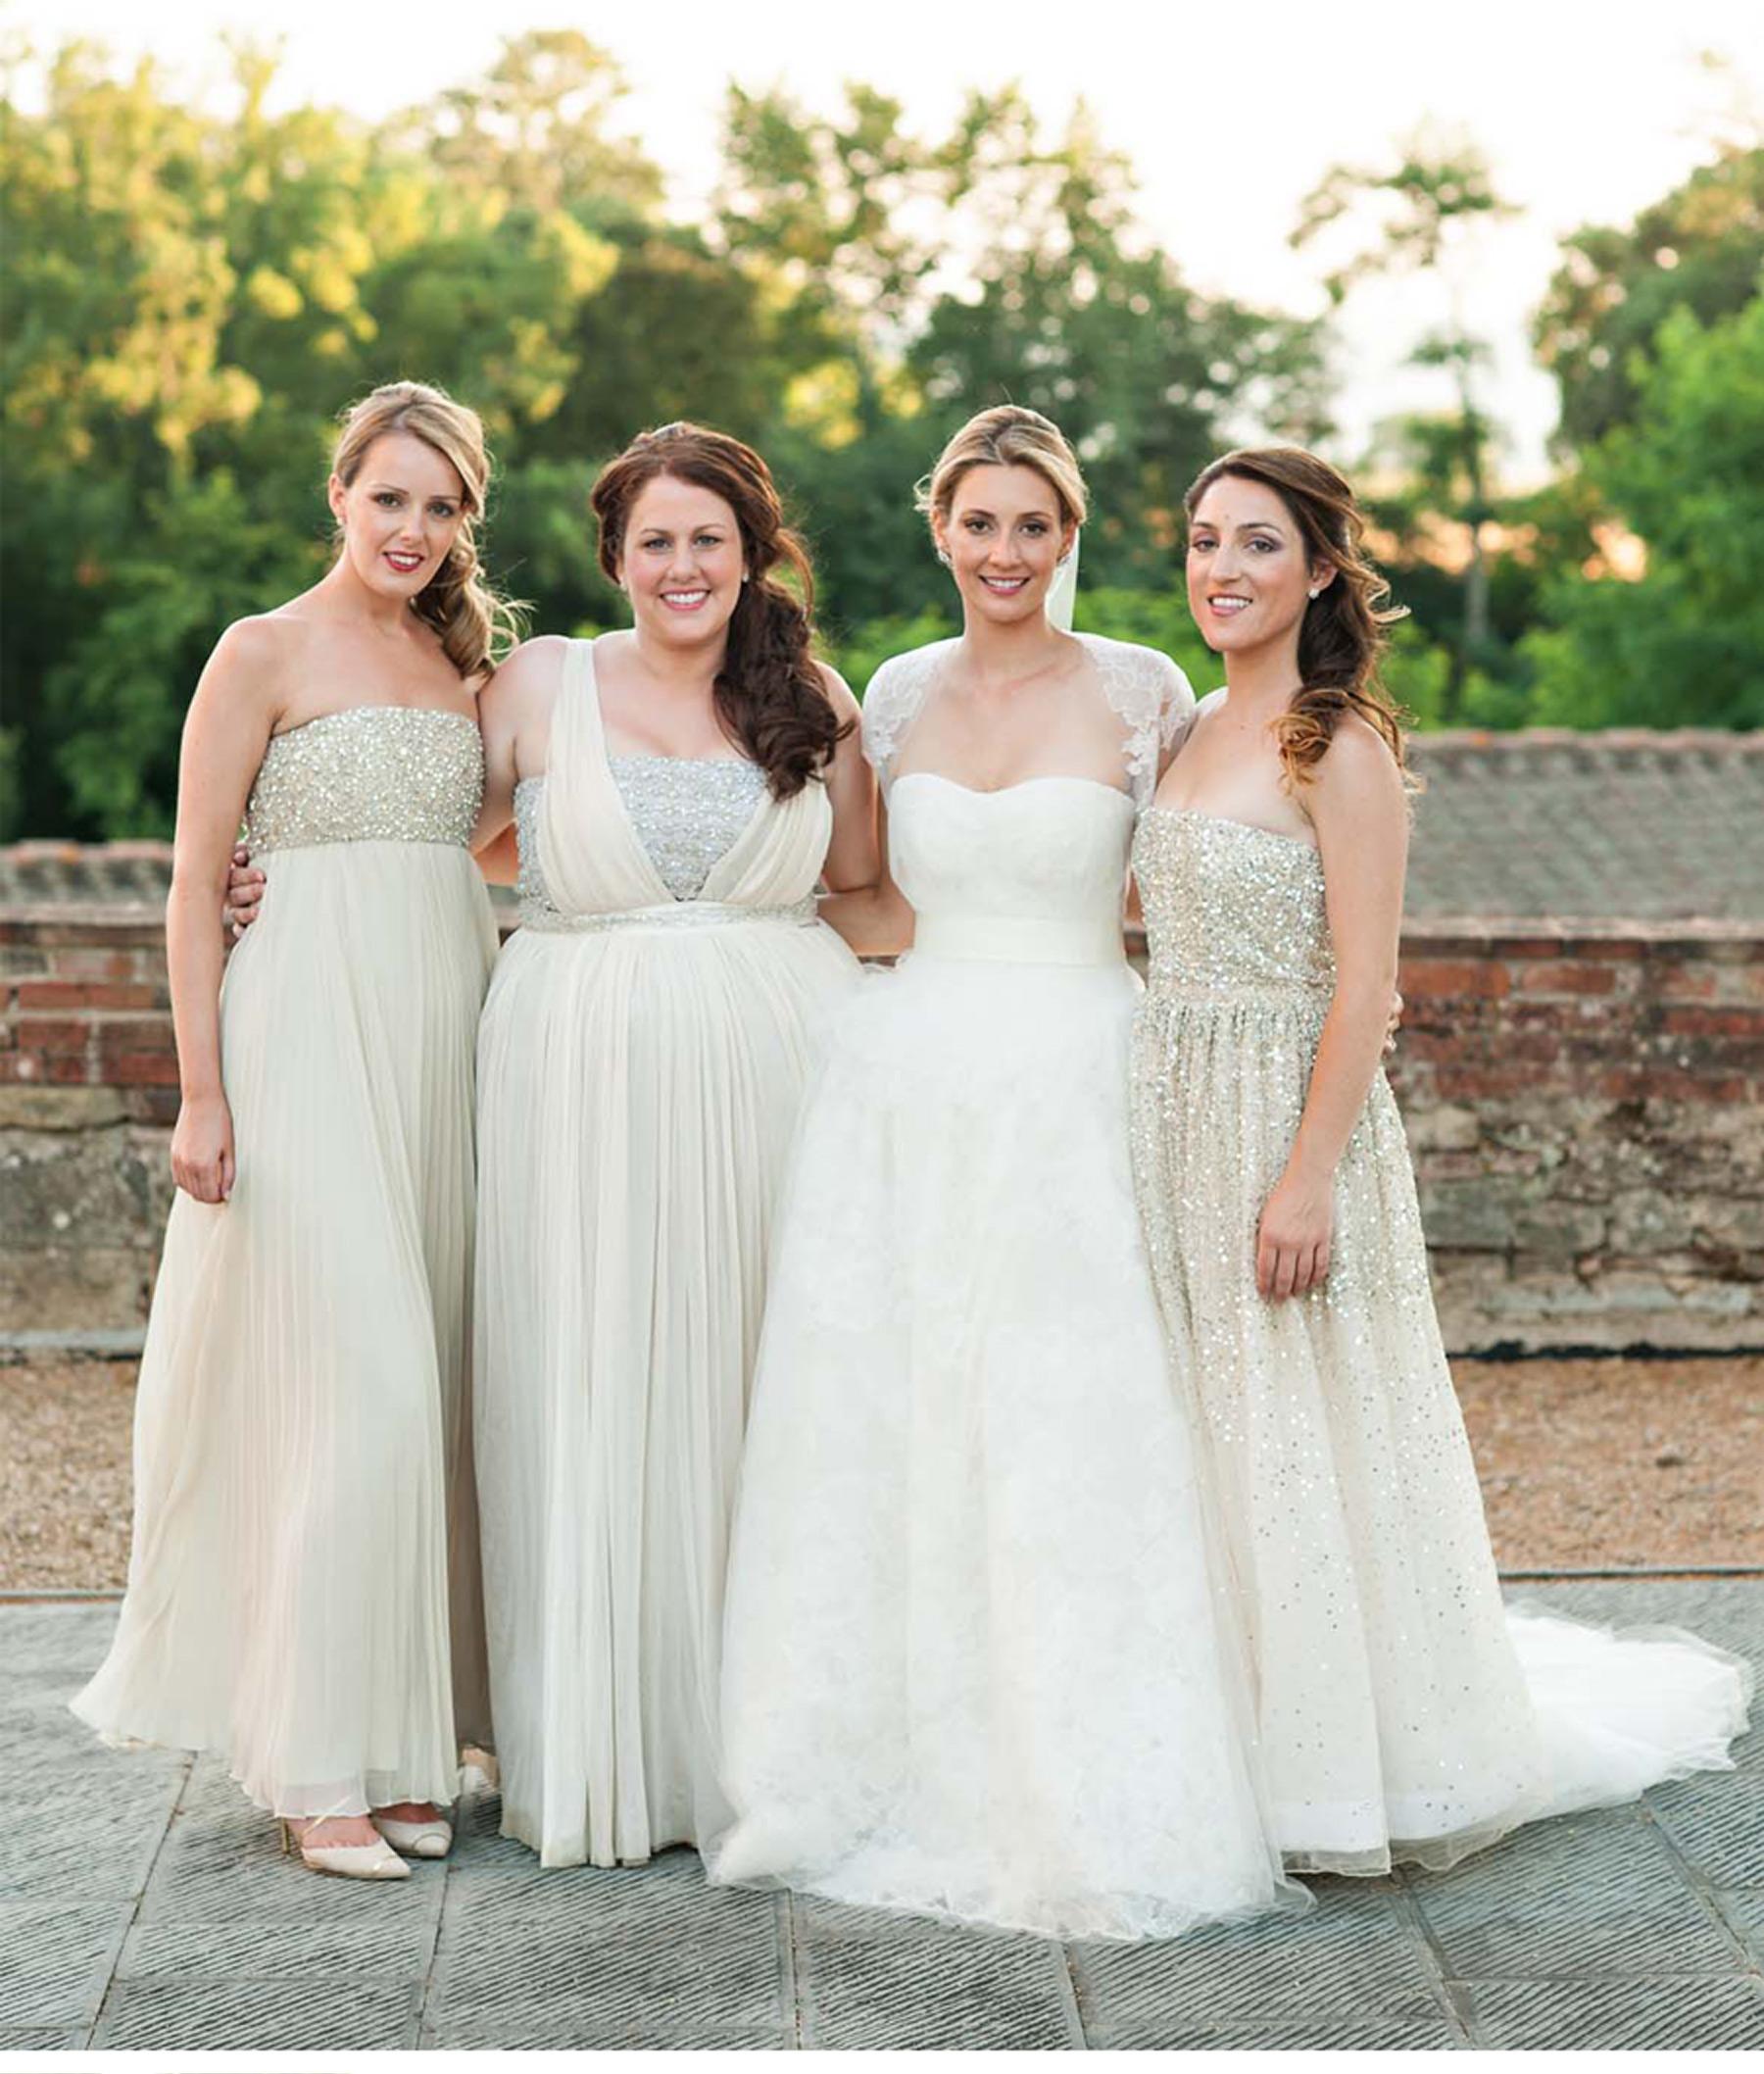 Our Muse - Italian Countryside Wedding - Be inspired by Meghan & Steven's Italian countryside wedding - wedding, luxury, italy, tuscany, il borro, garden, green, bride, groom, ceremony, portrait, vineyard